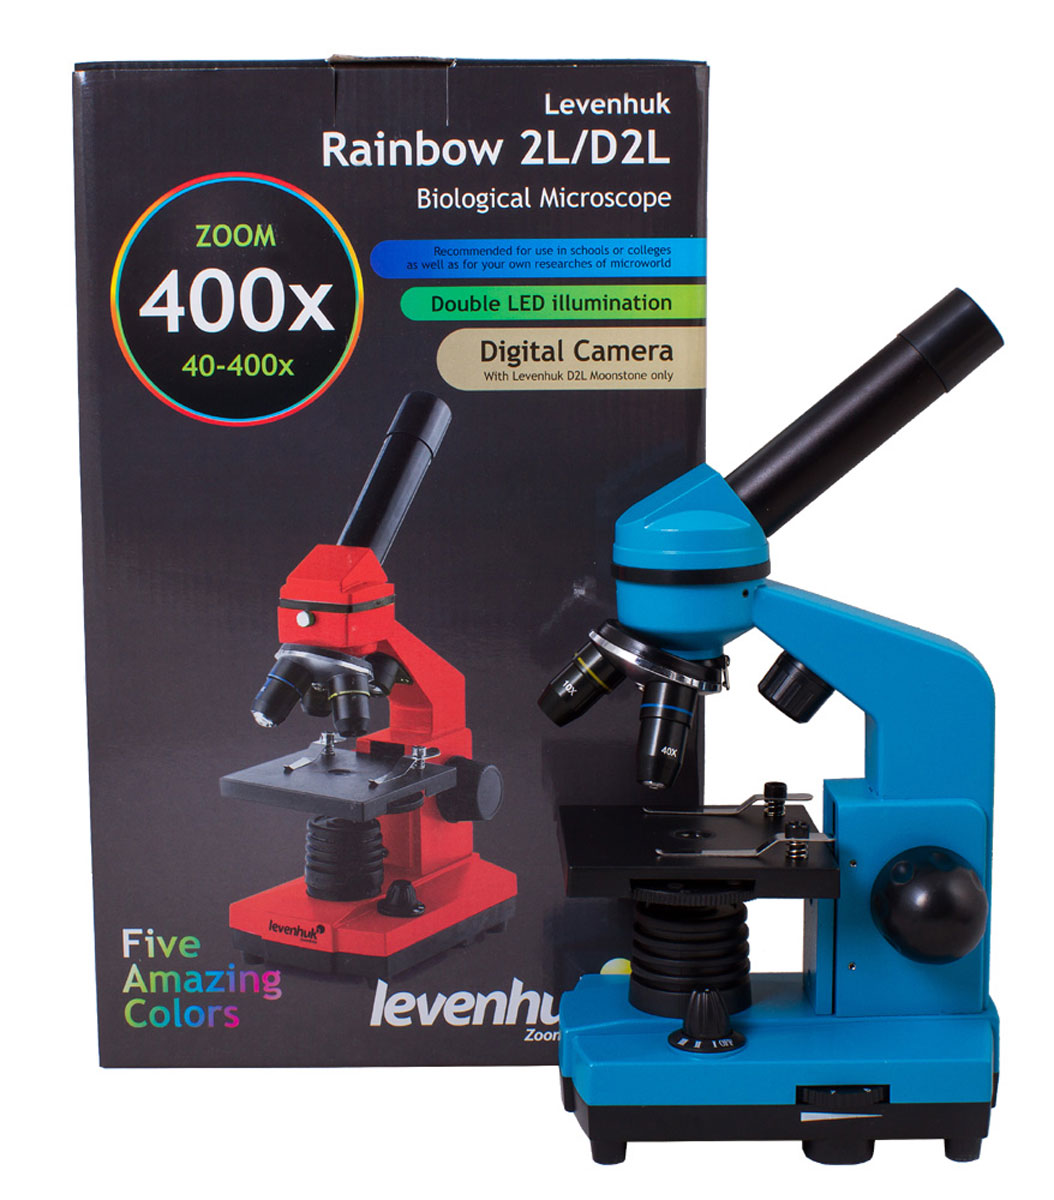 Levenhuk Rainbow 2L, Azure микроскоп